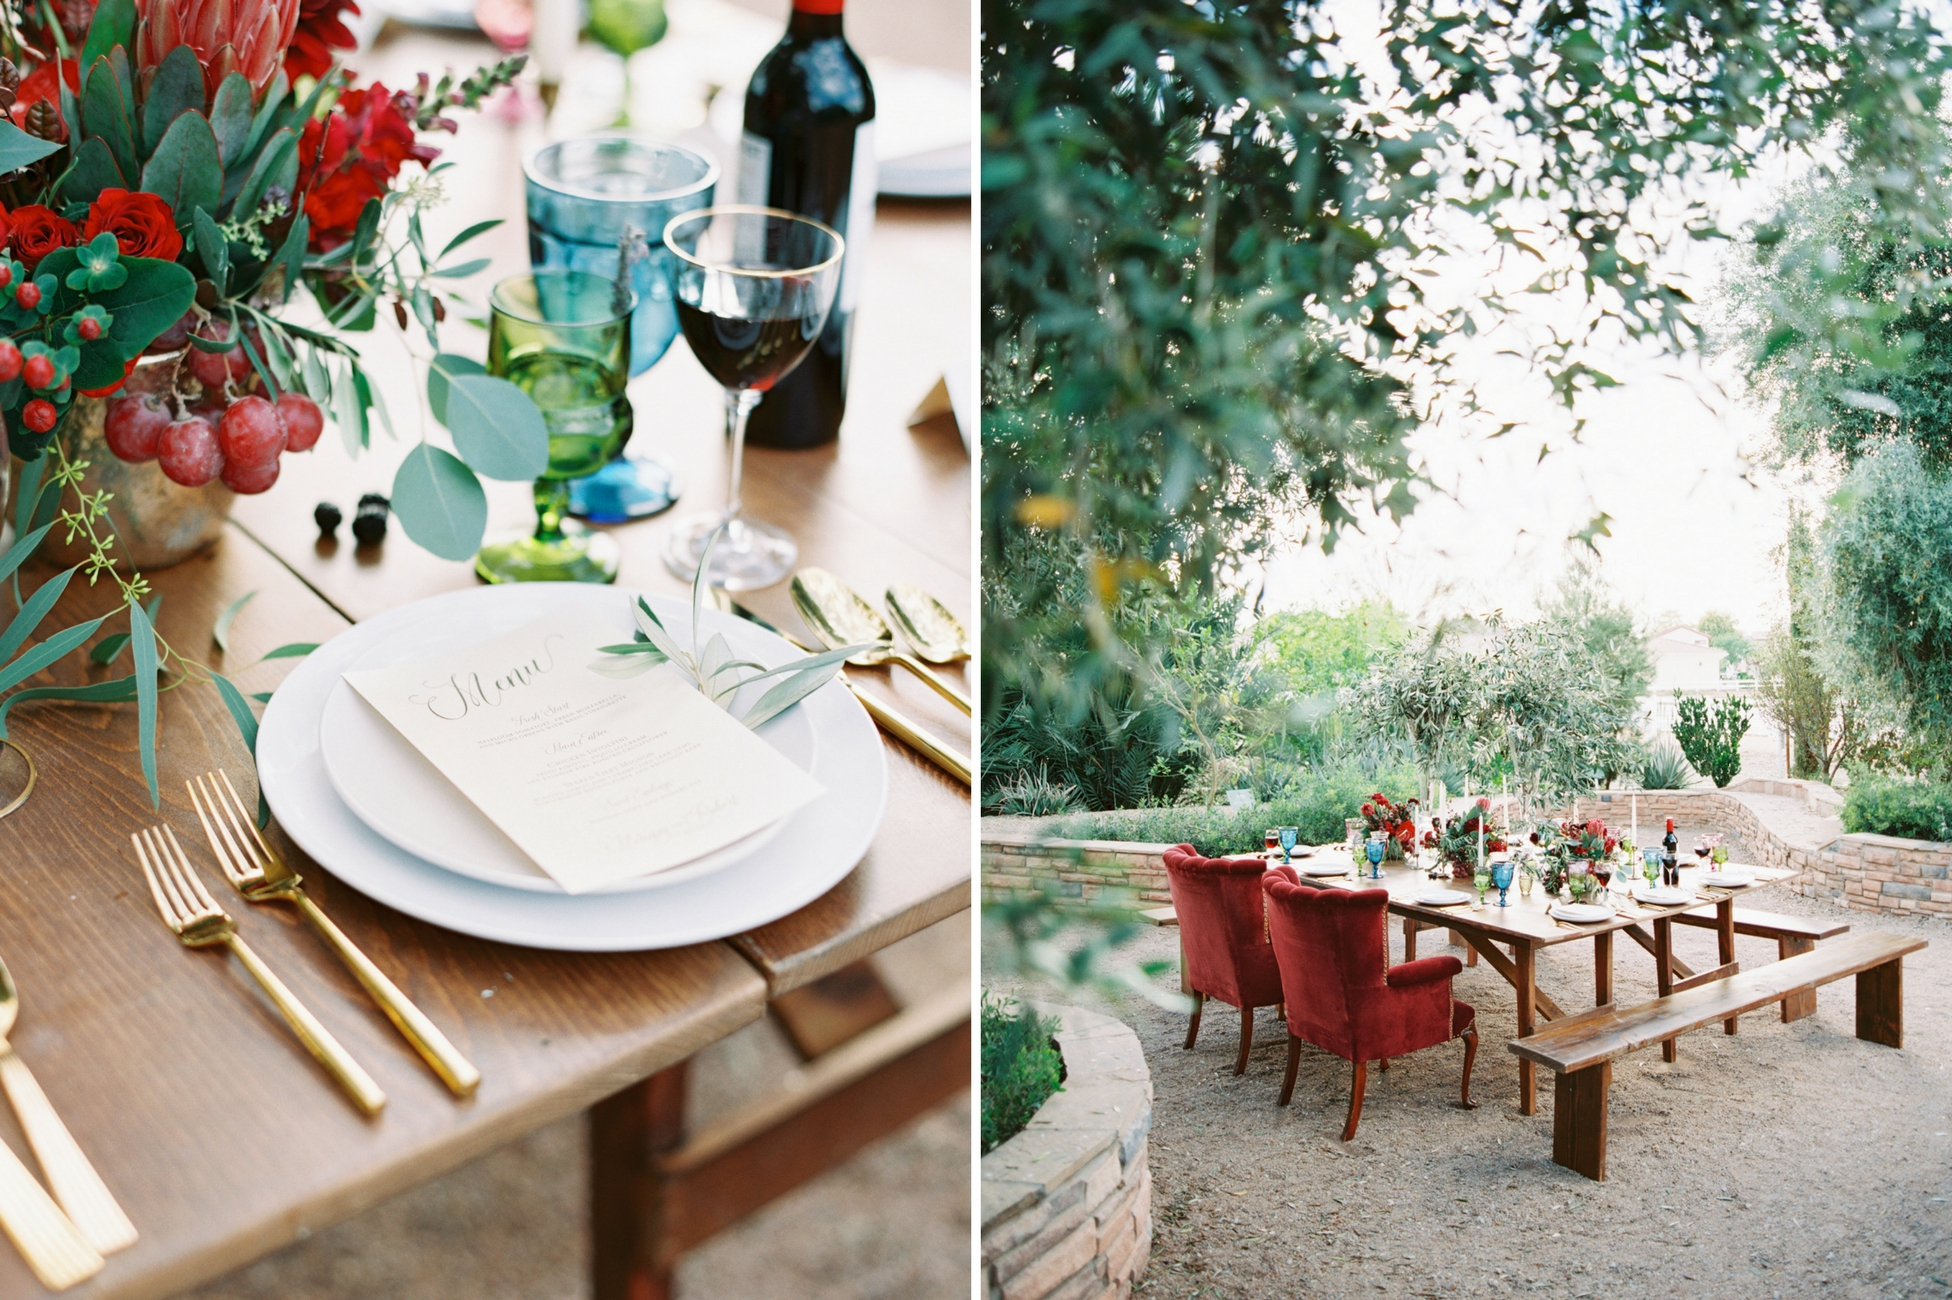 Tremaine Ranch - AZ Arizona Wedding & Event, Vintage, Furniture, Tableware, & Specialty Rentals in Phoenix, Tucson, Flagstaff, Sedona, Tempe, Chandler, Mesa, Gilbert, Prescott, Payson 53.jpg